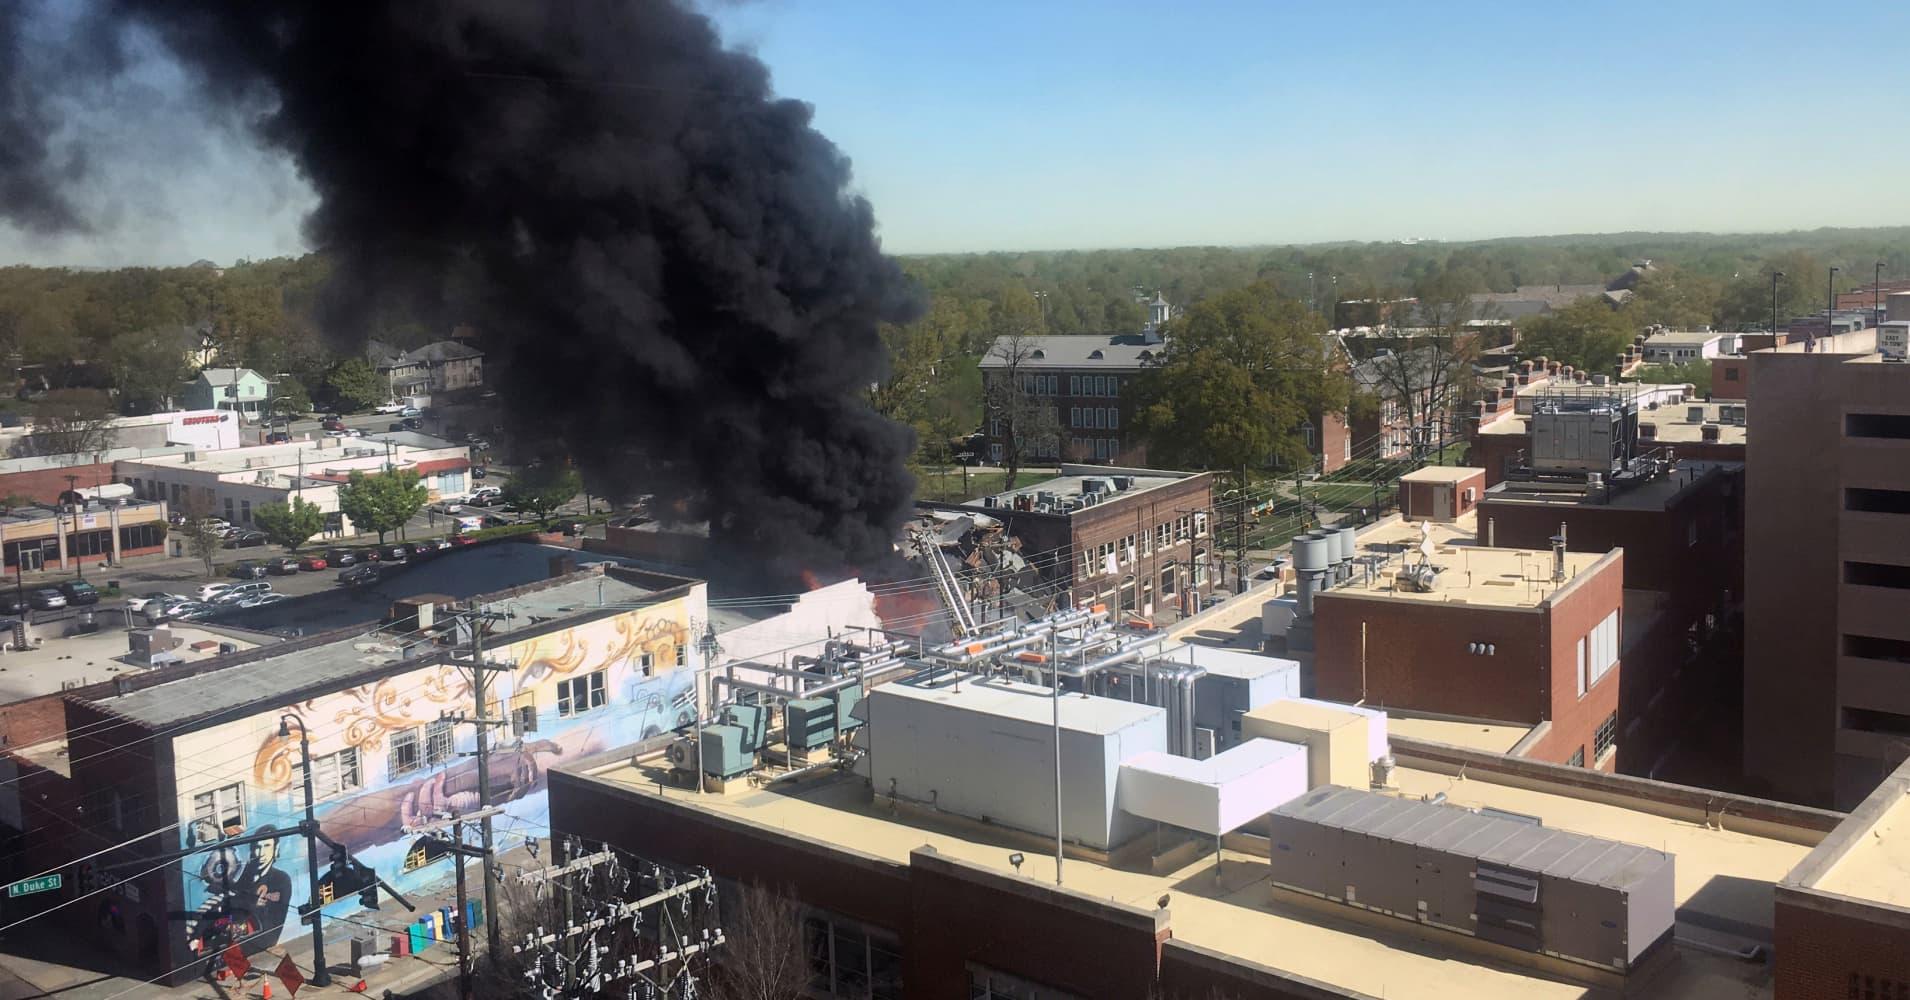 1 dead, 15 injured in North Carolina gas explosion